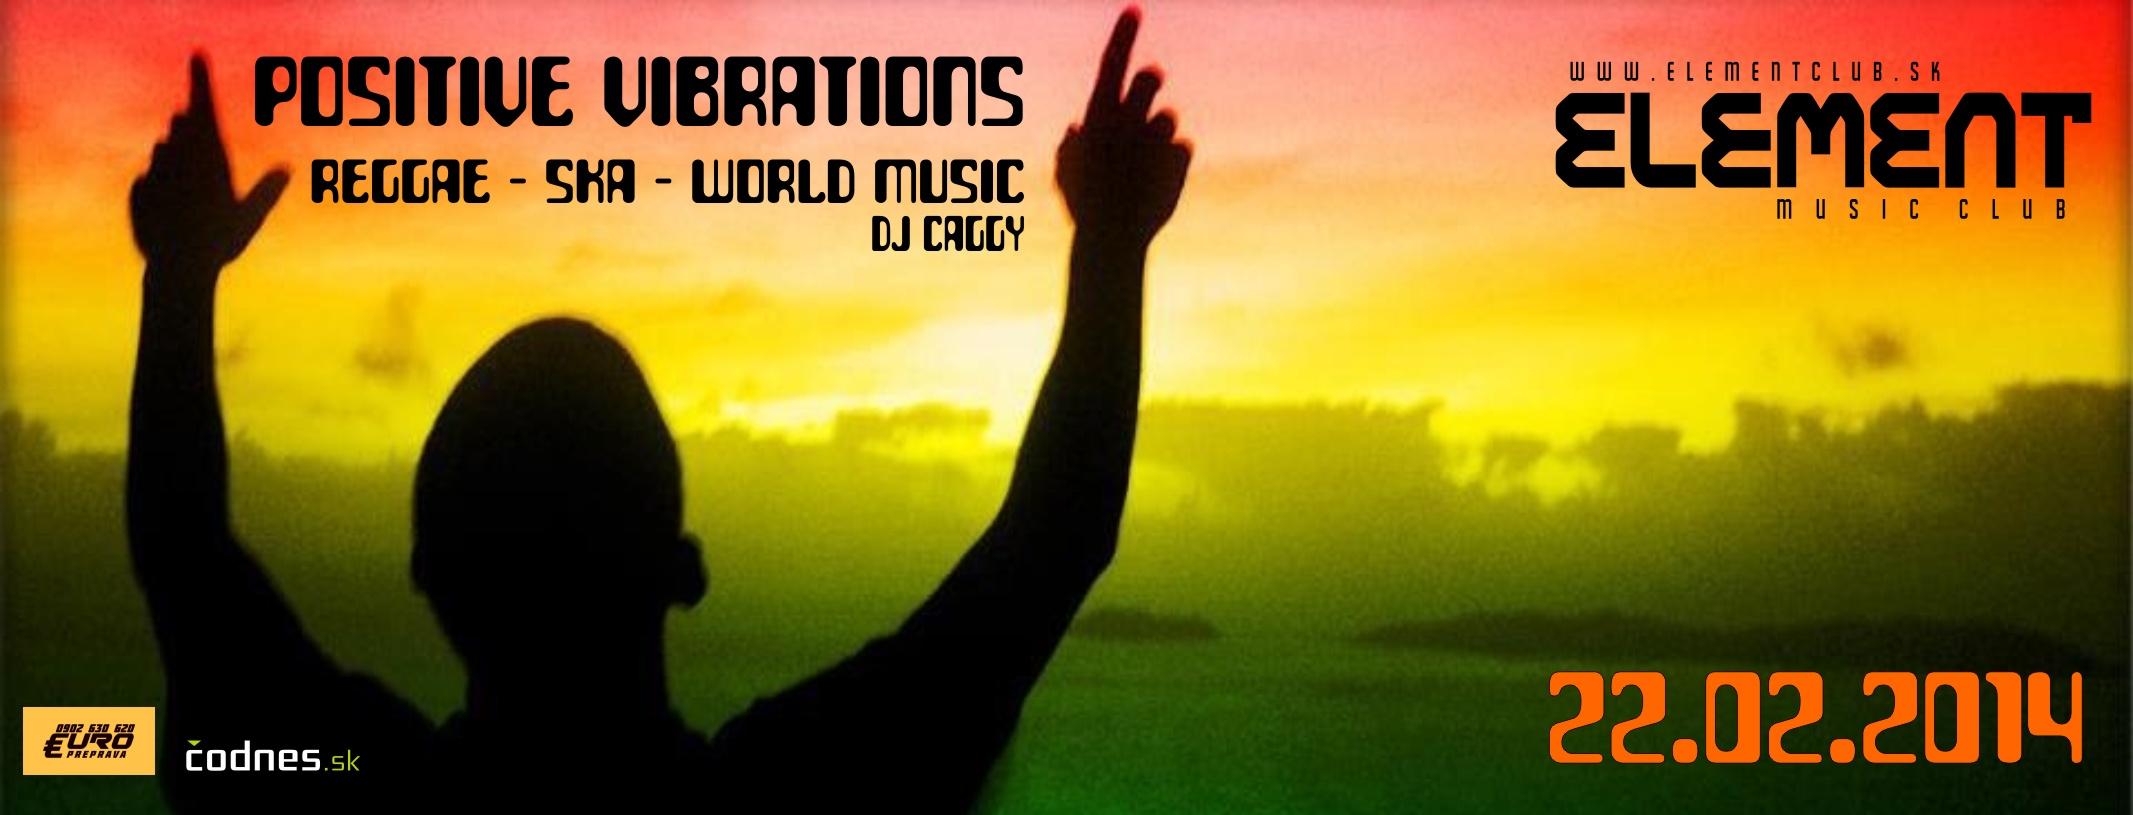 POSITIVE VIBRATIONS (reggae / ska / world music party)